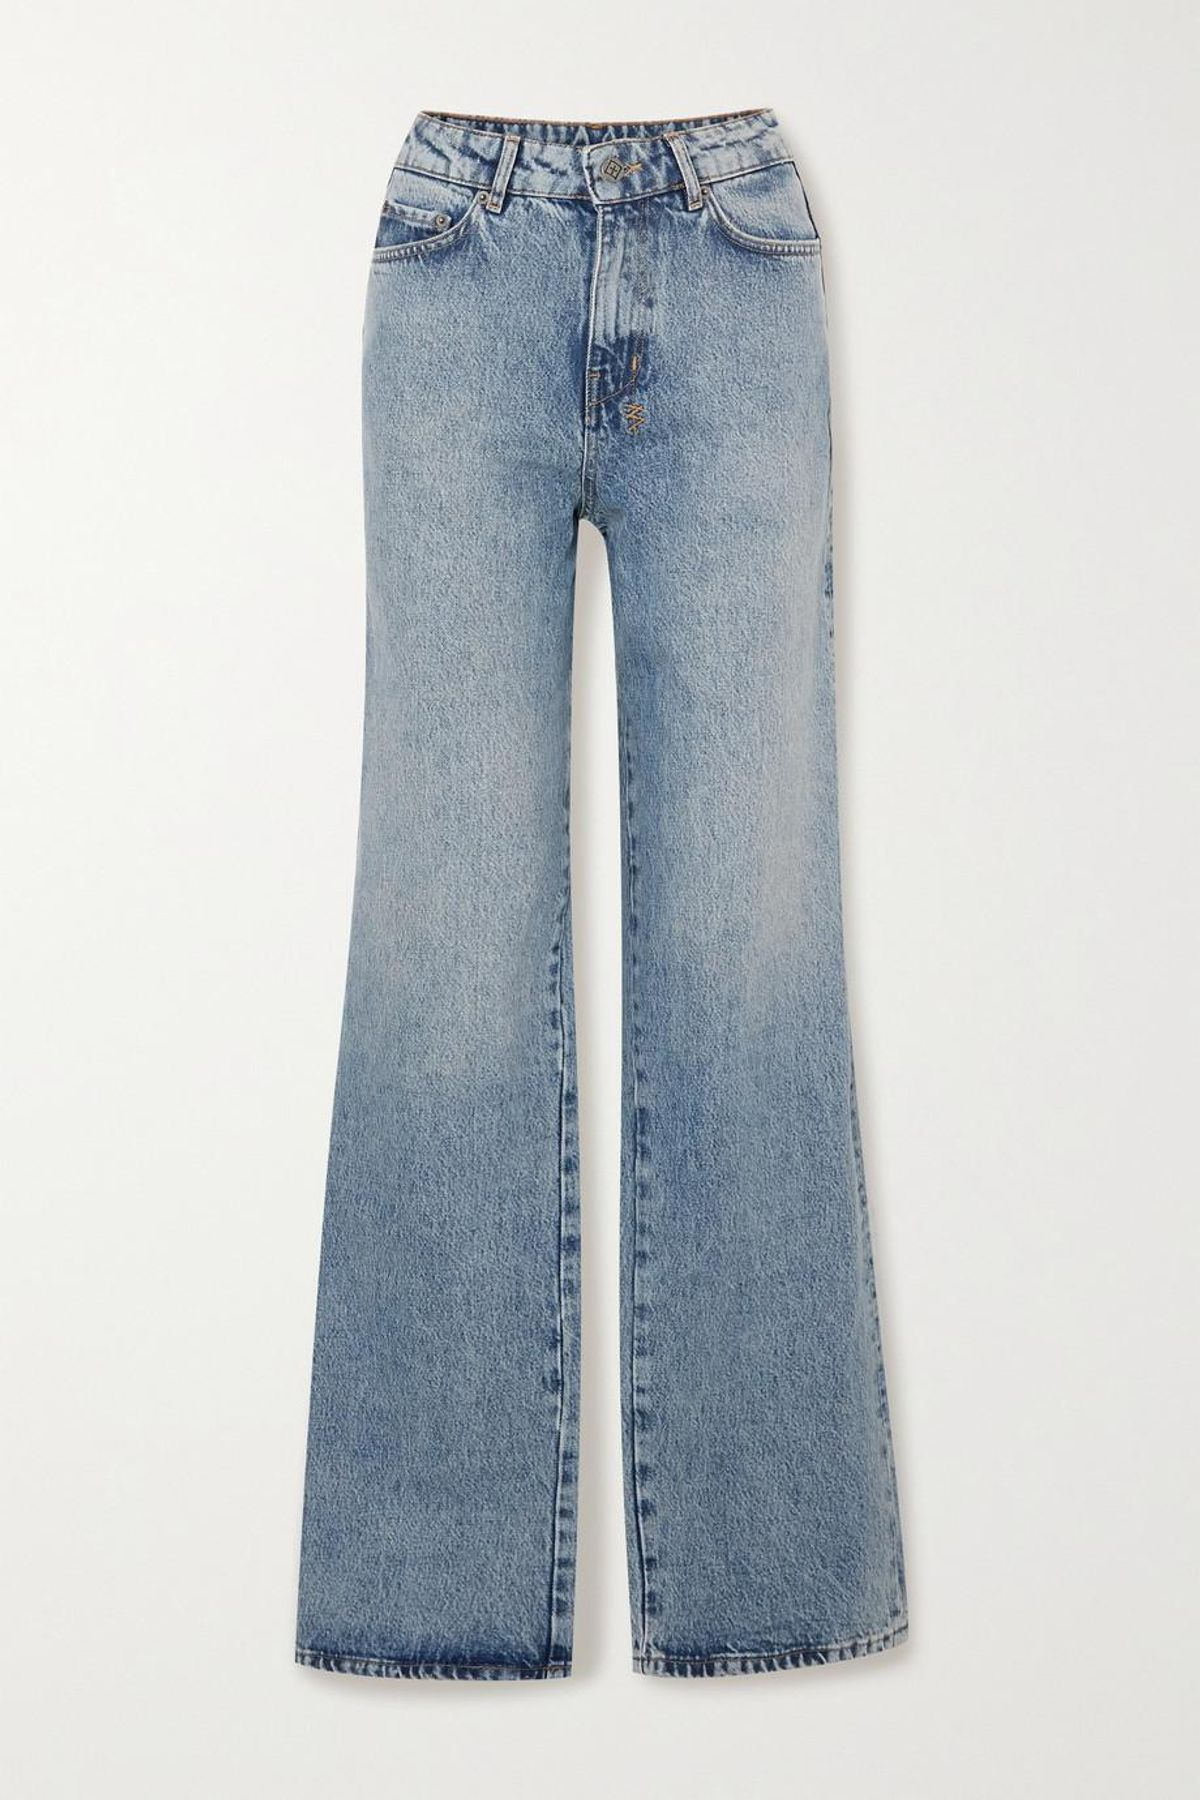 Kicker Jinx High Rise Wide Leg Jeans